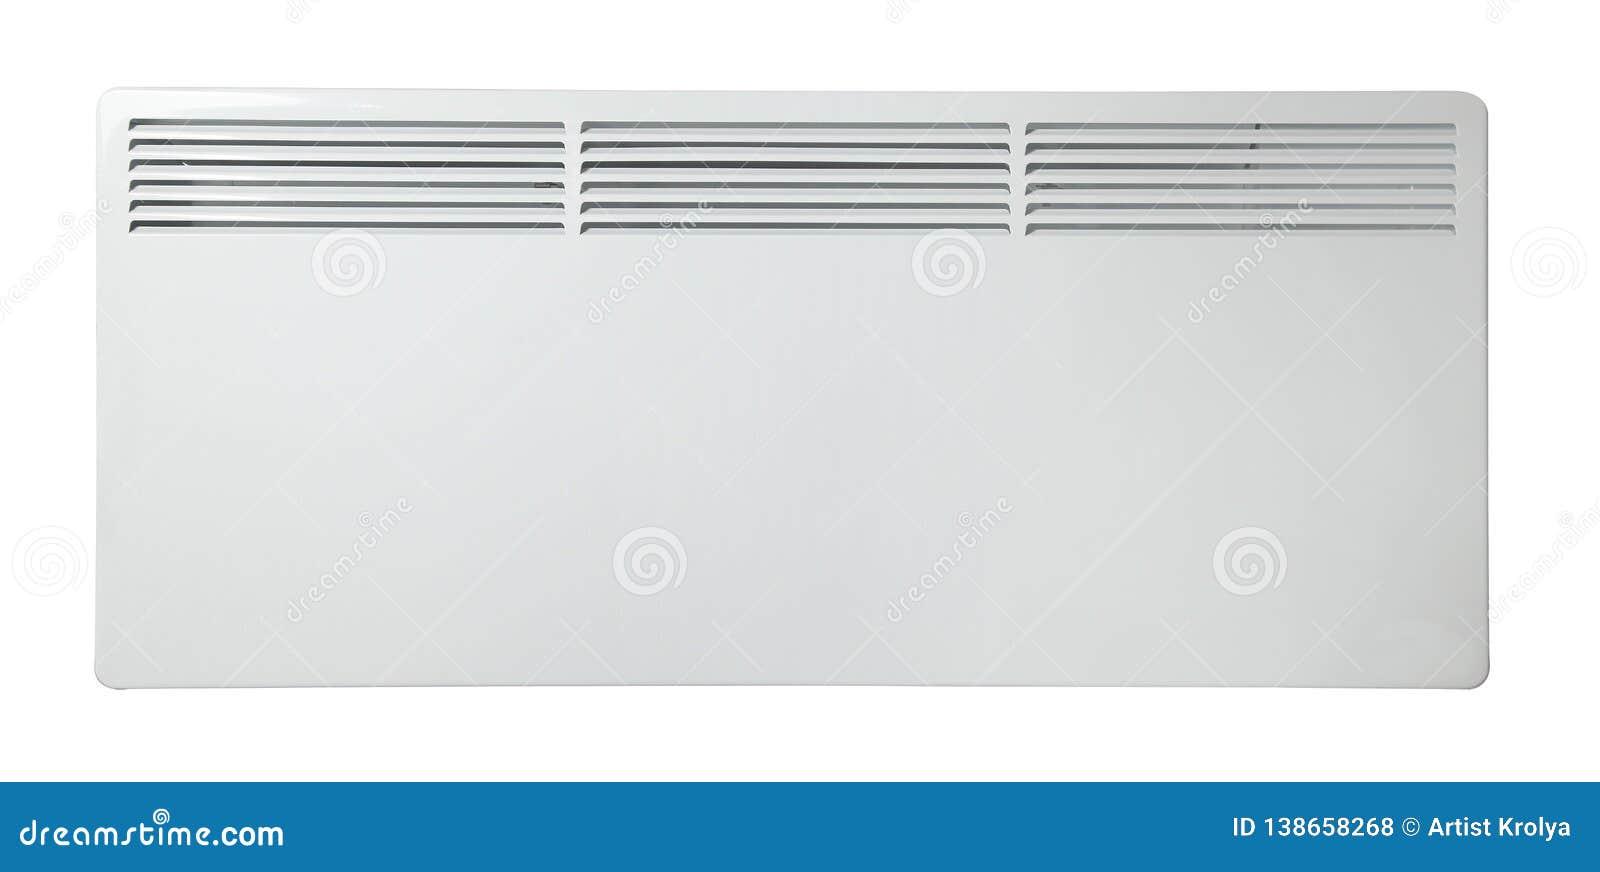 V?rmeelementbatteri element bakgrund isolerad white